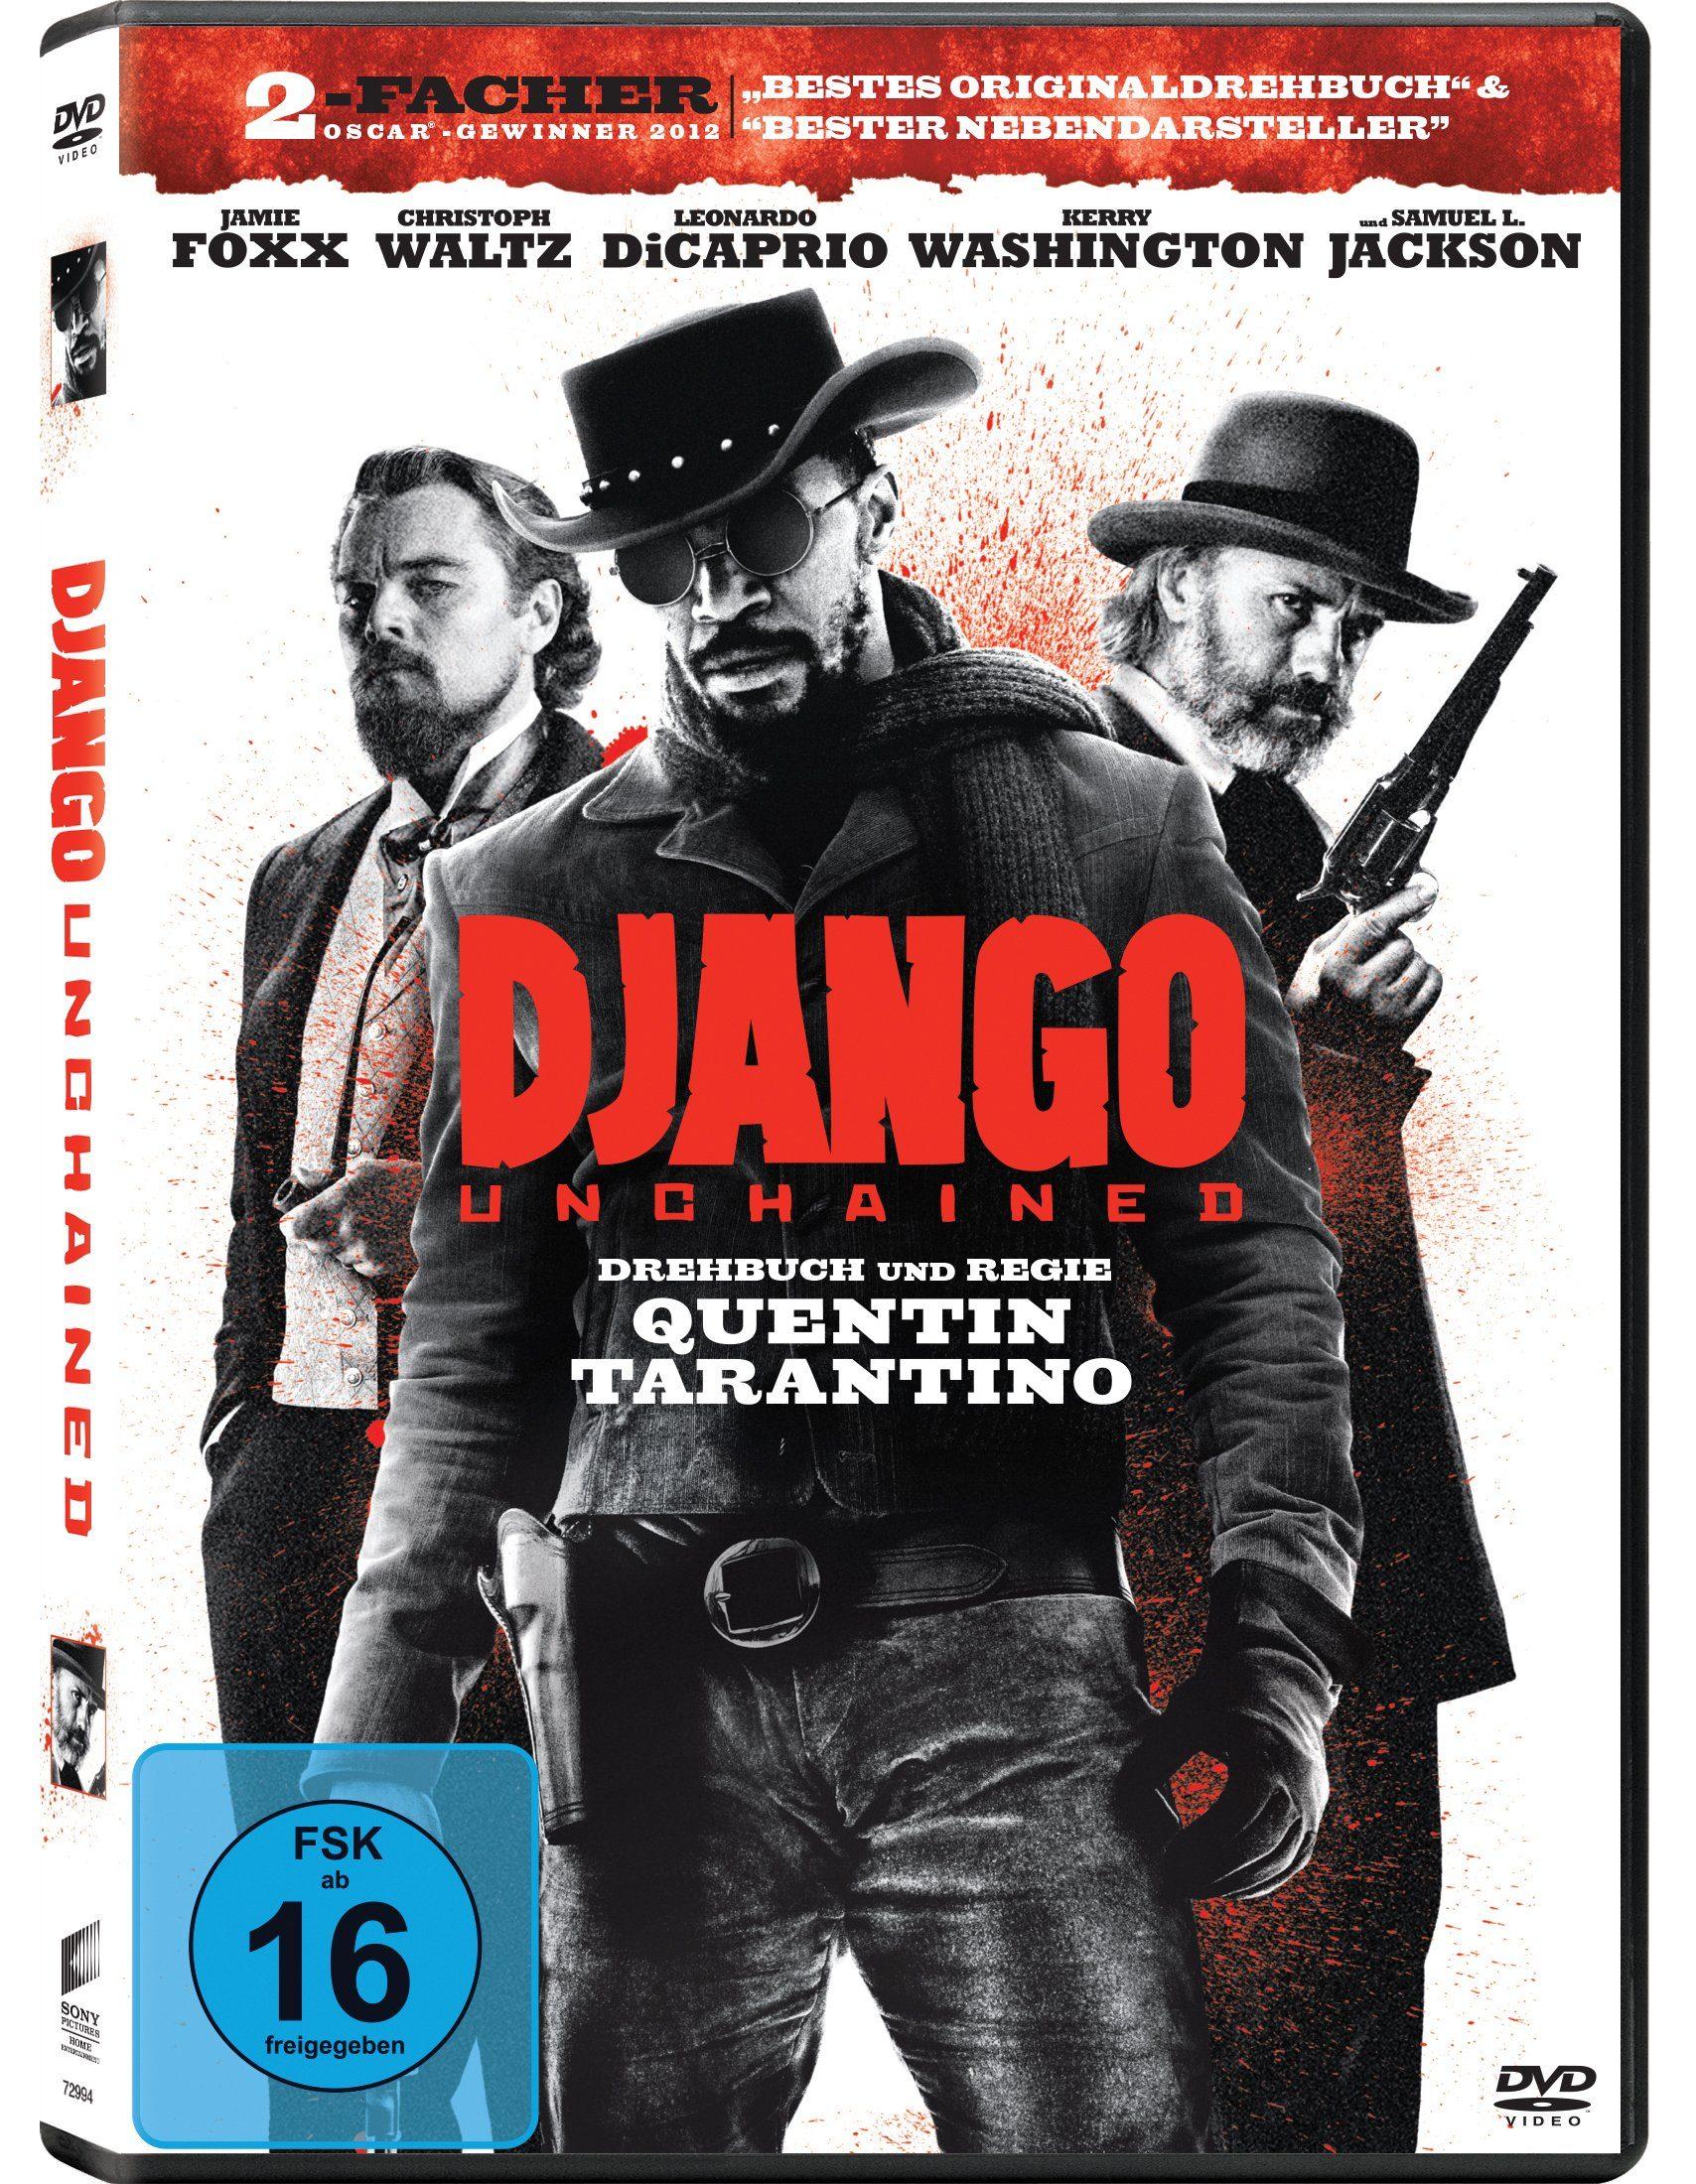 Sony Pictures DVD »Django Unchained«